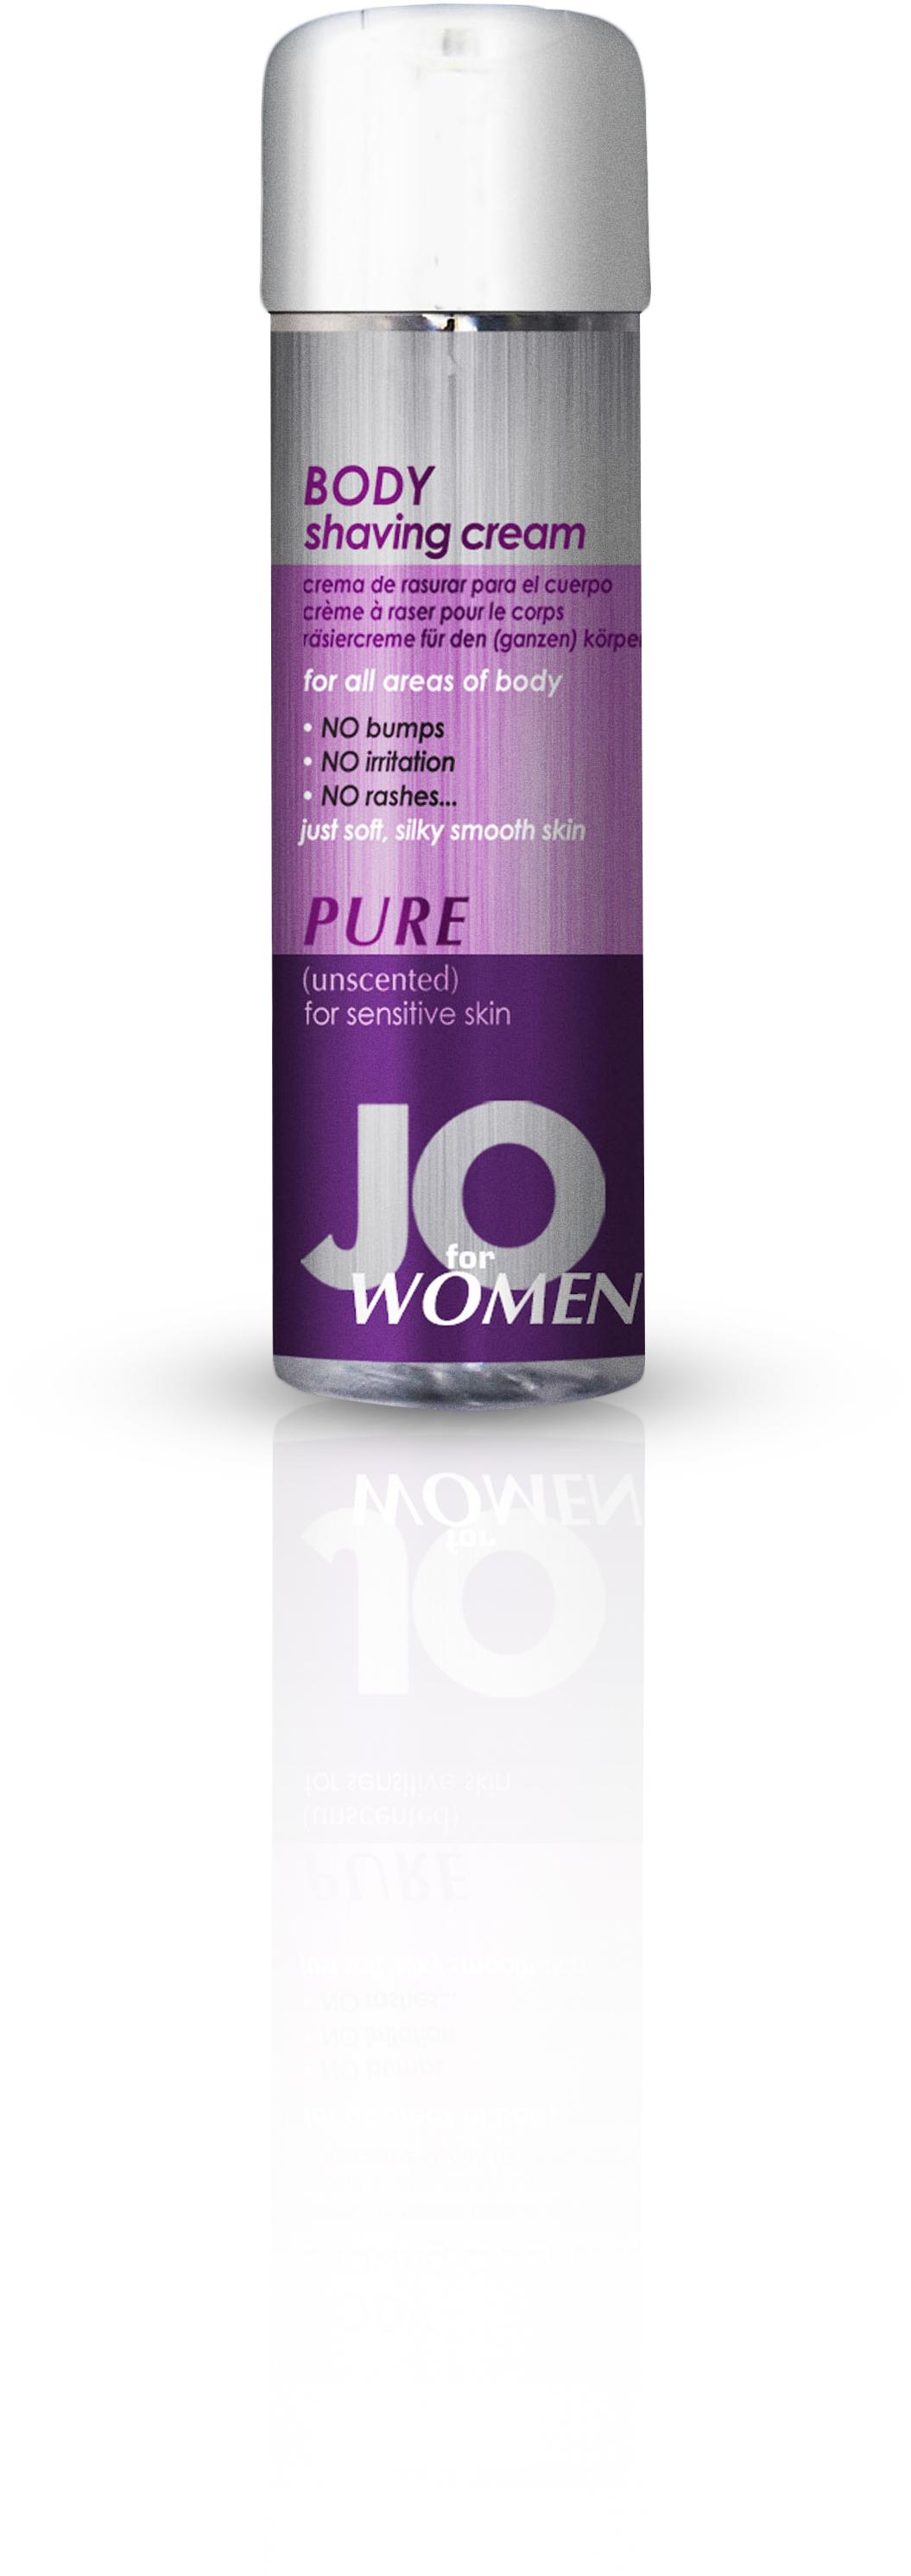 40181_JO_shavecream_women_pure_8oz.jpg